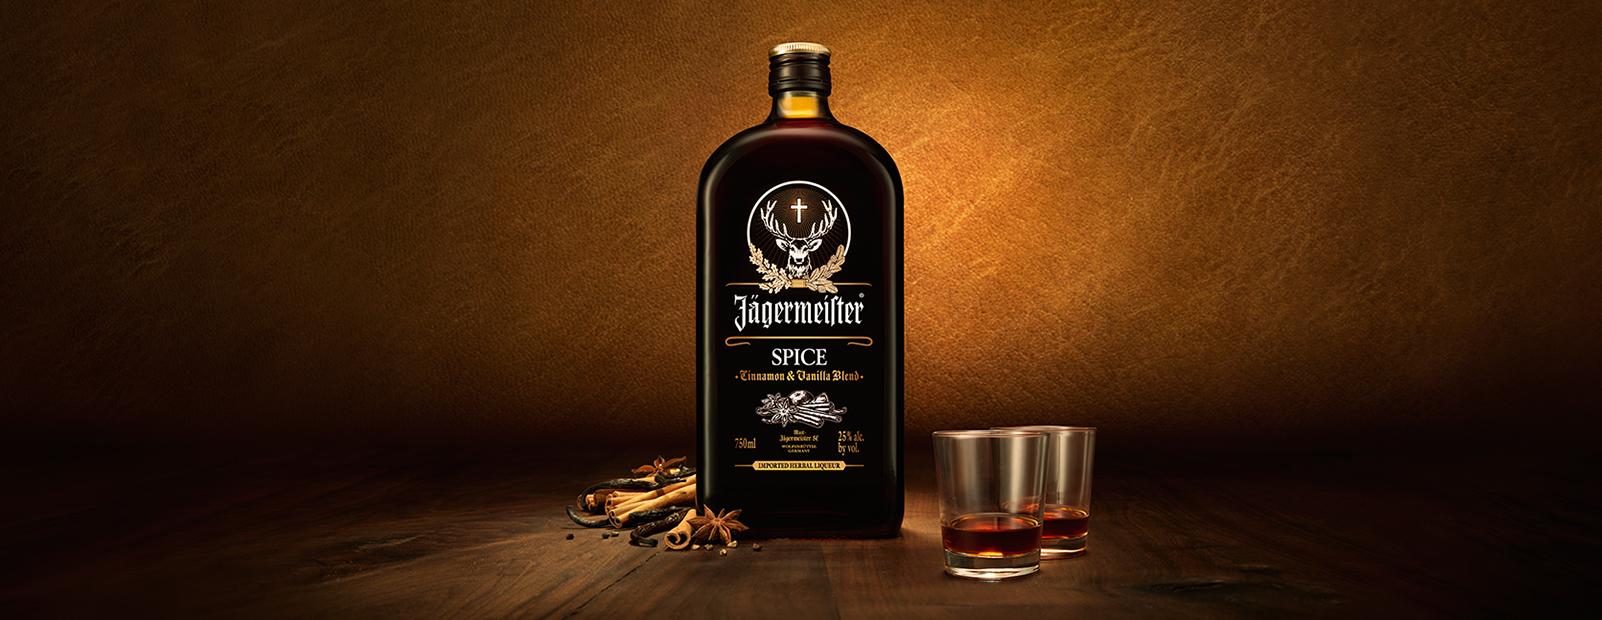 Mistress_Jagermeister-Spice